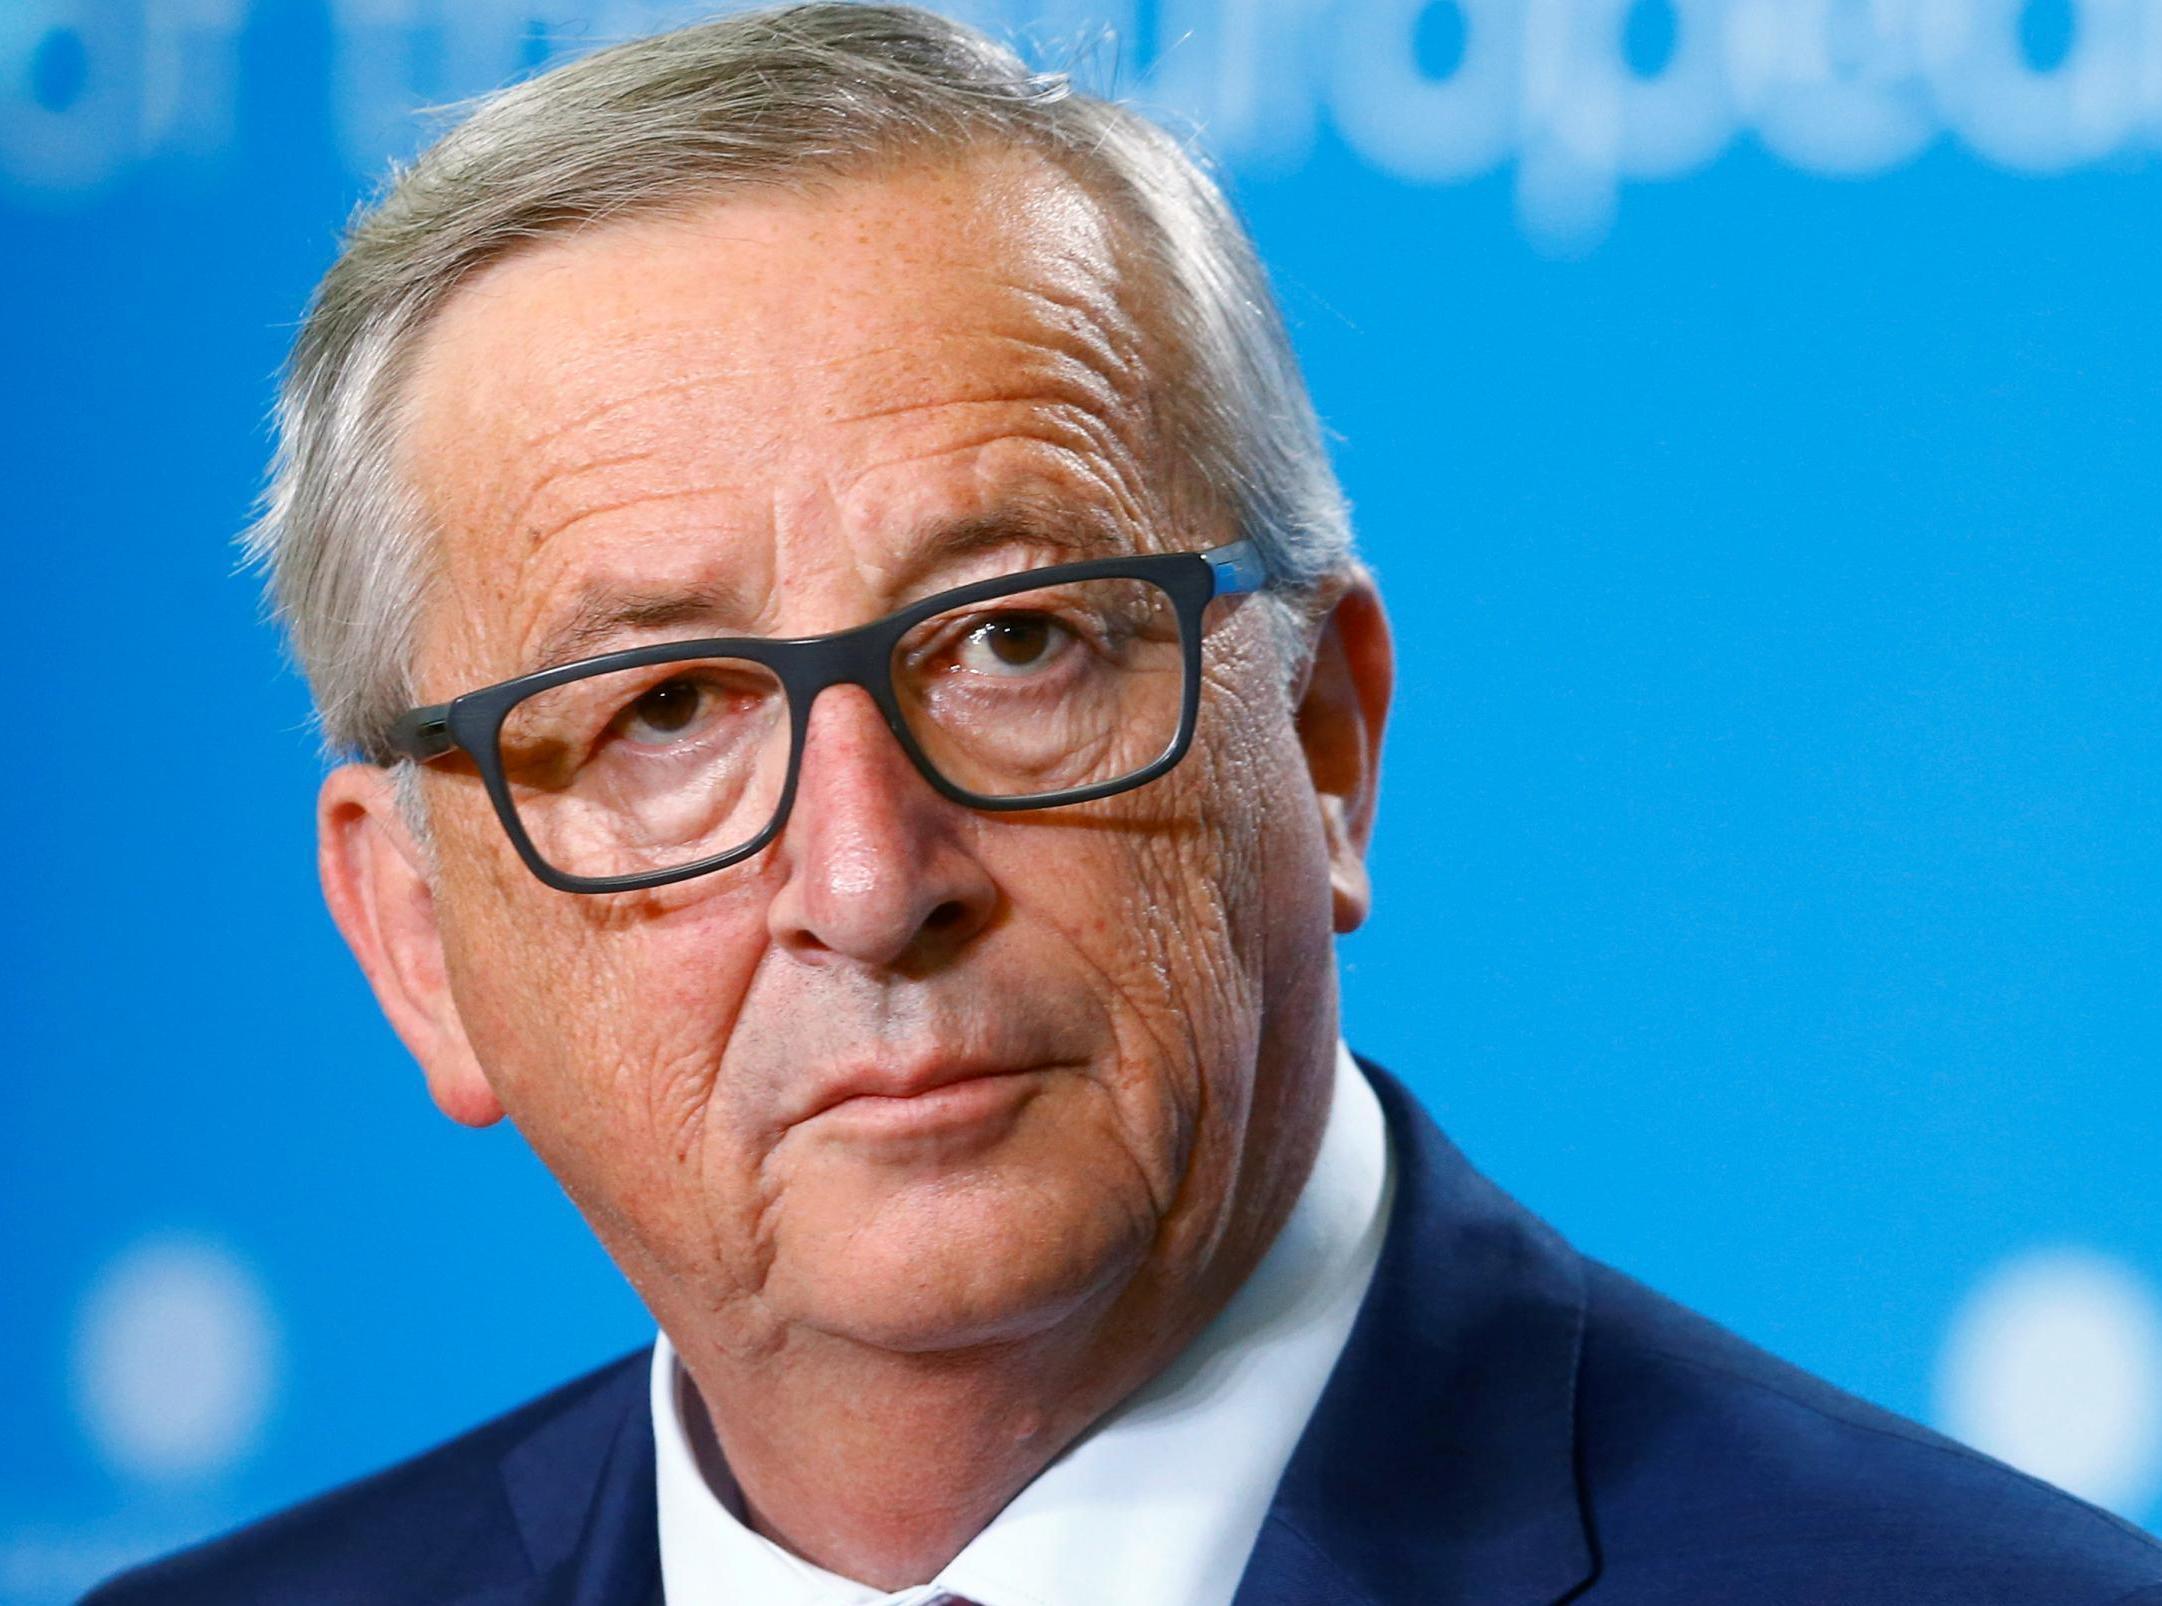 Eu and japan close to major free trade agreement the independent you are ridiculous juncker tells near empty eu parliament platinumwayz